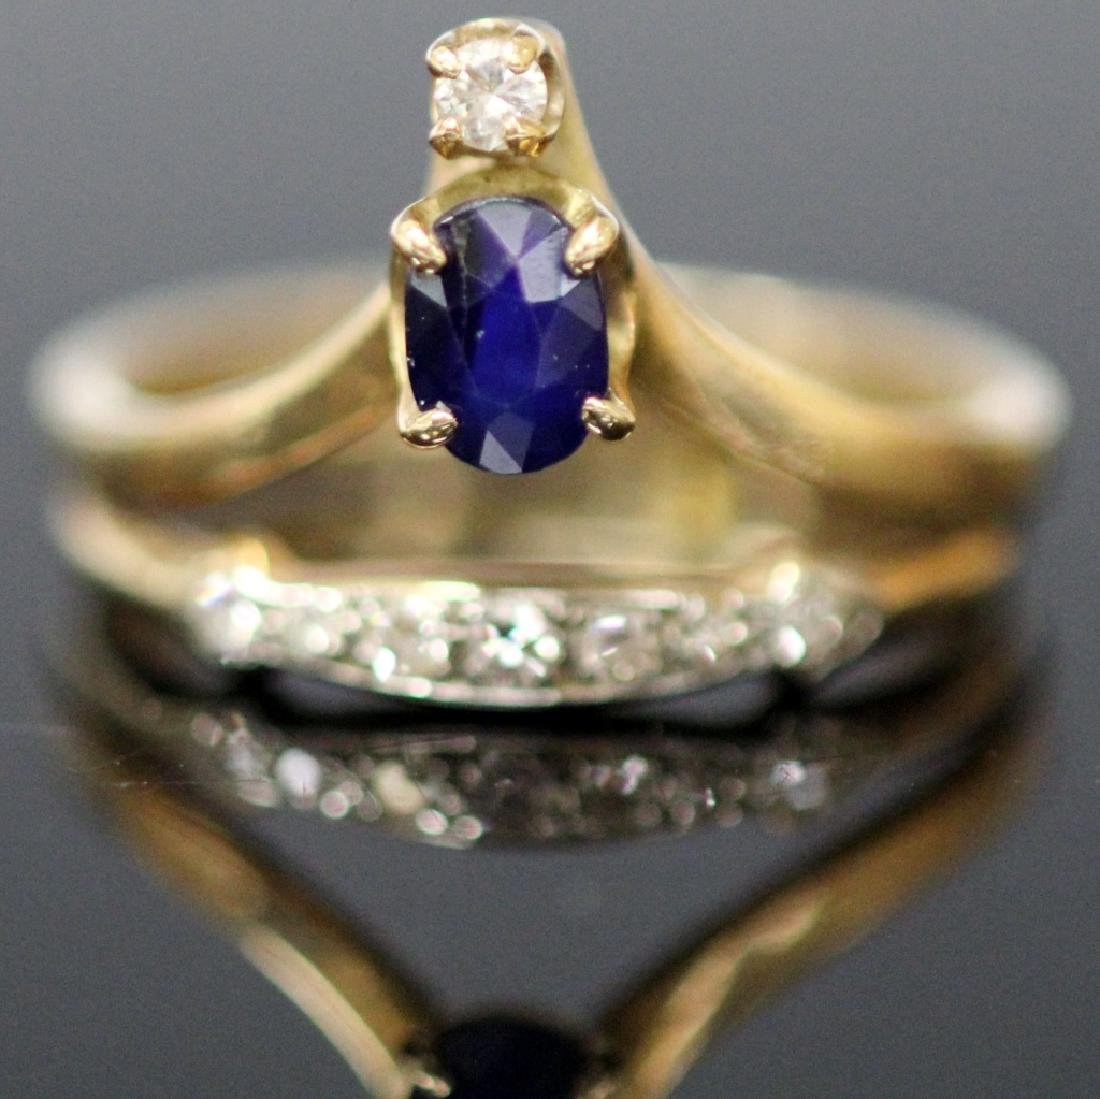 LADY'S SAPPHIRE & DIAMOND 14KT YELLOW GOLD RING